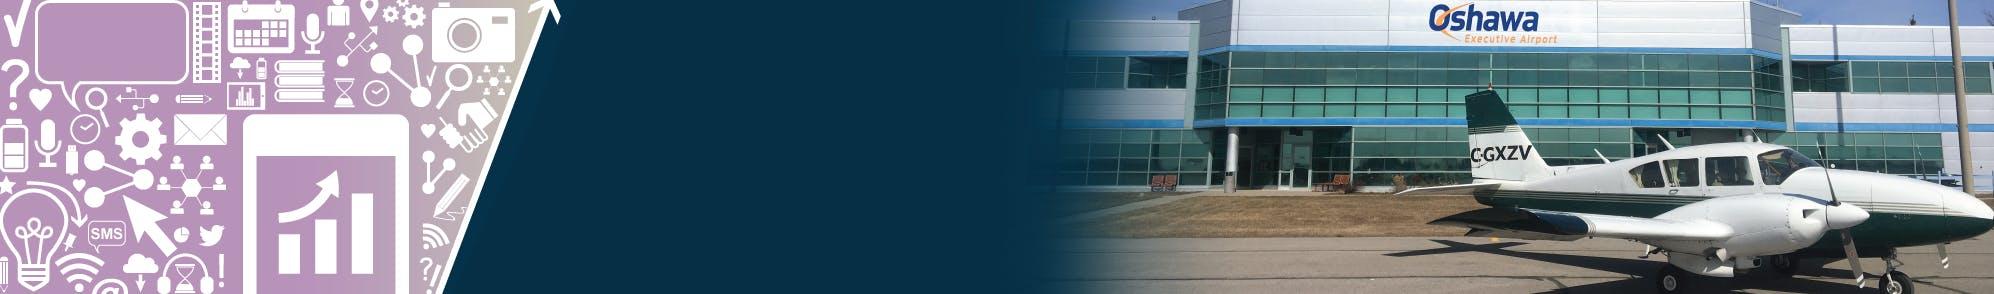 Draft 2020-2024 Oshawa Executive Airport Business Plan Workshops